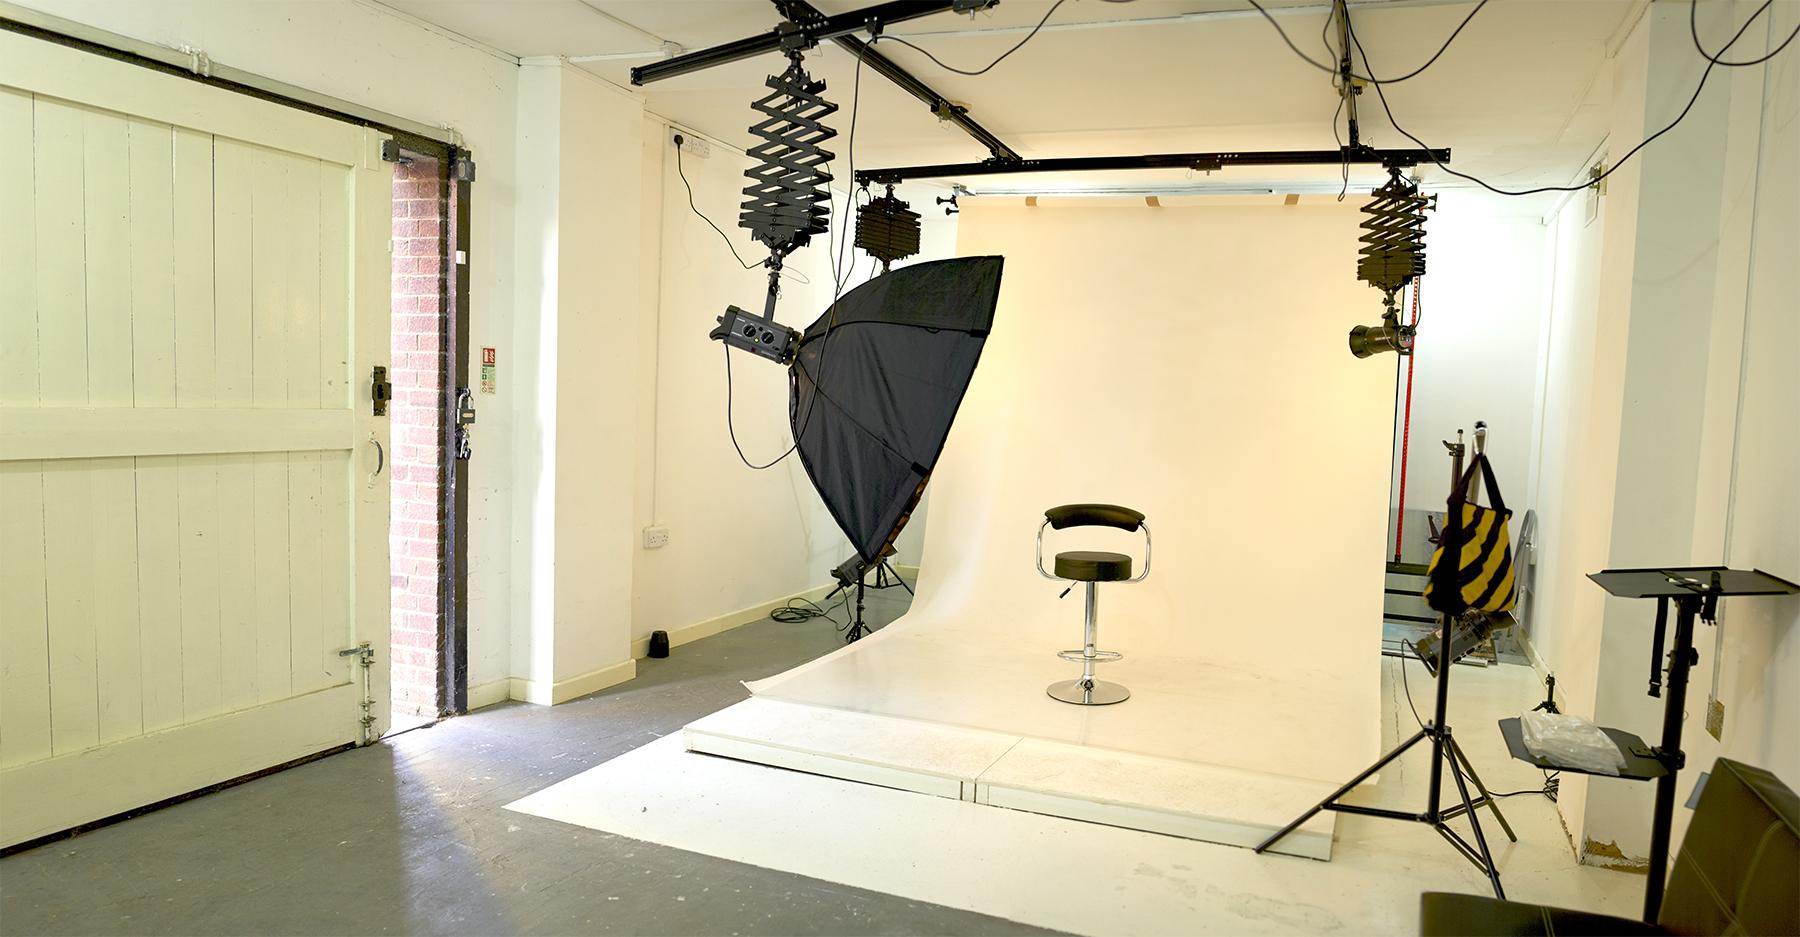 London Rd studio, gloucester